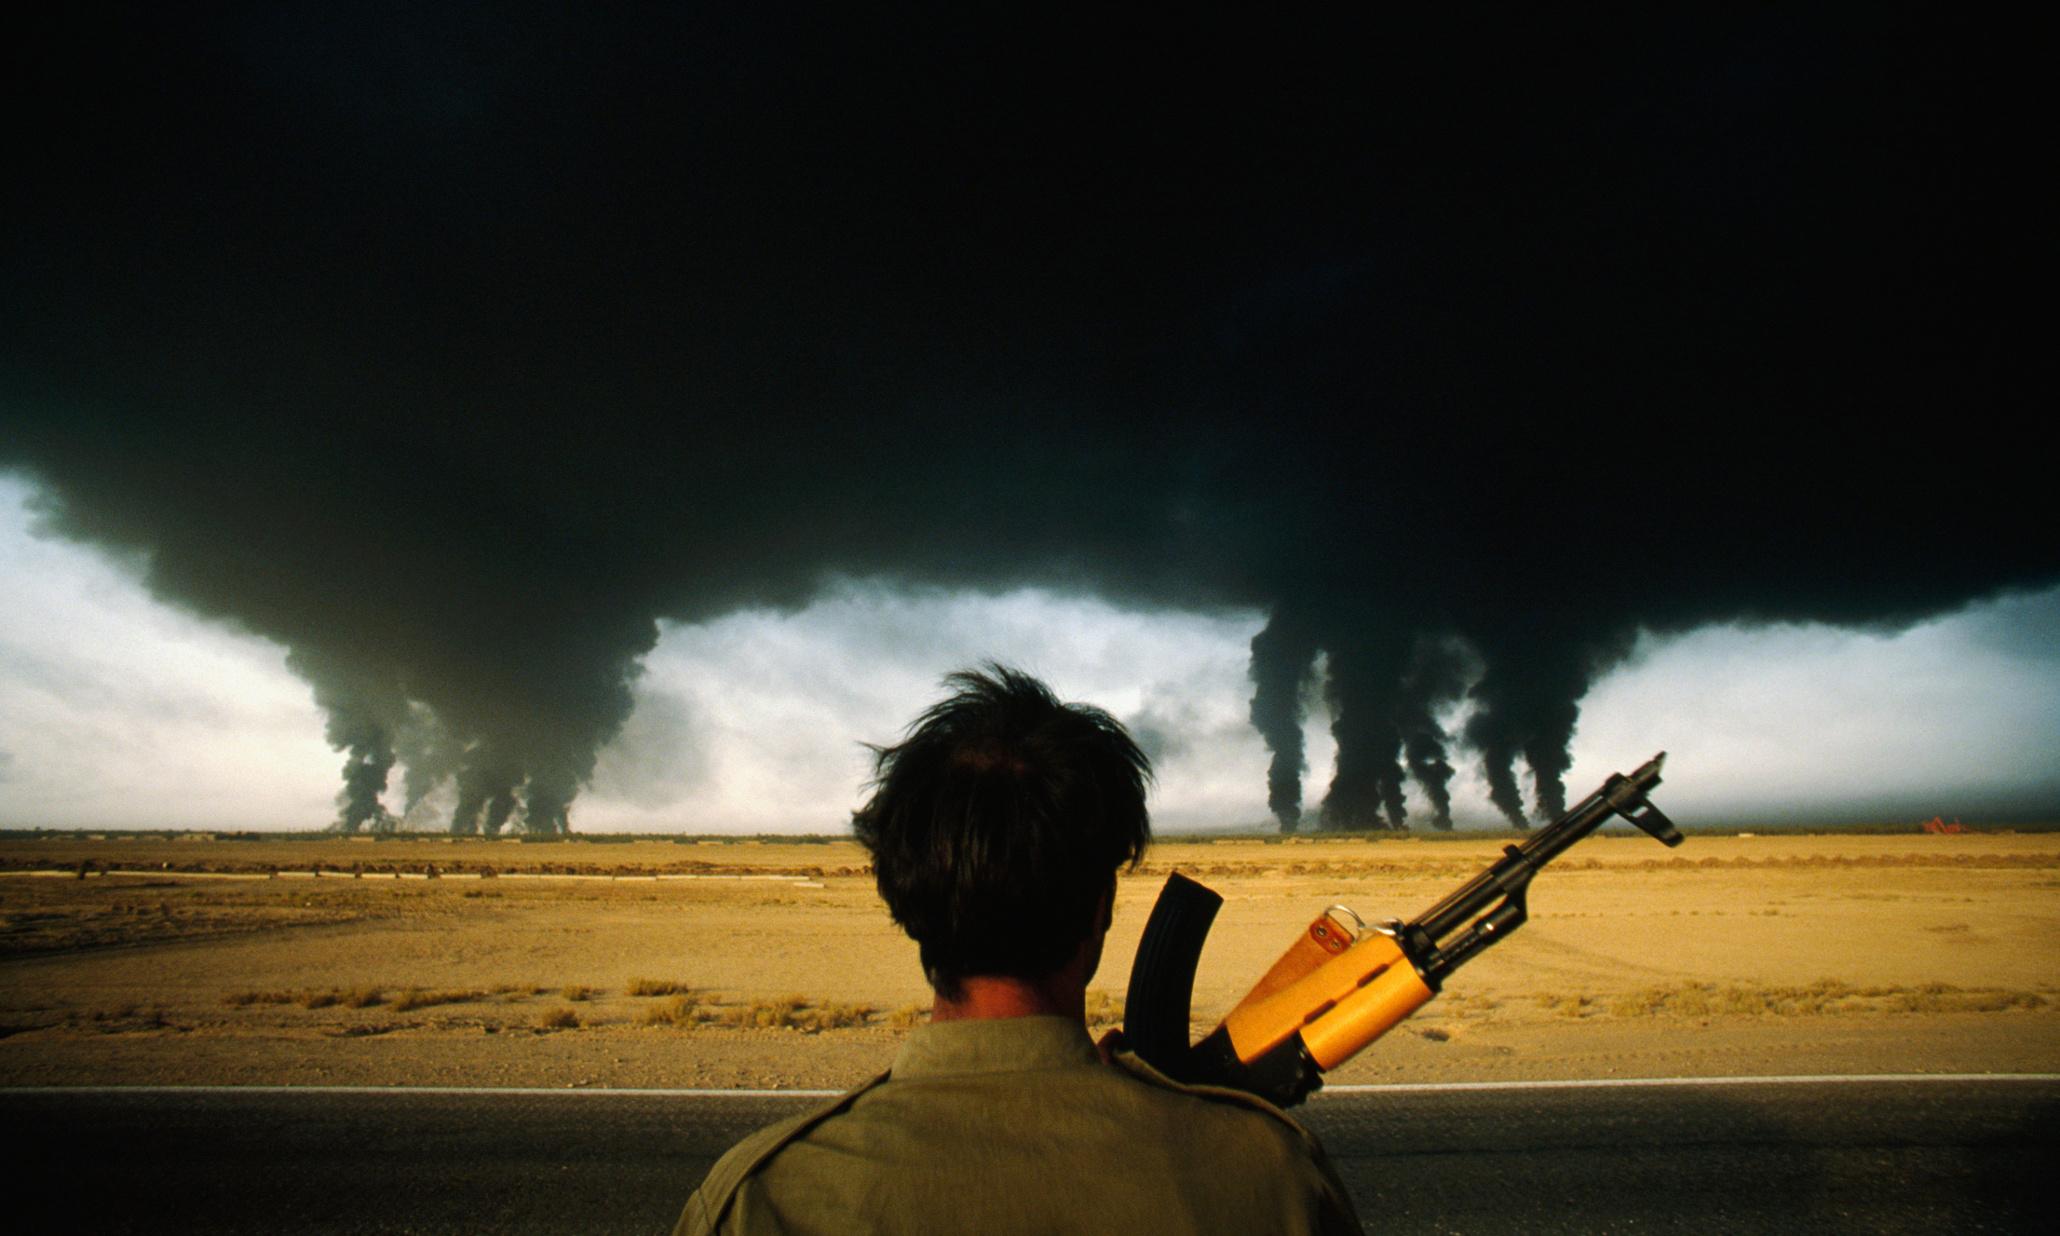 İran - Irak Savaşı 1980 1